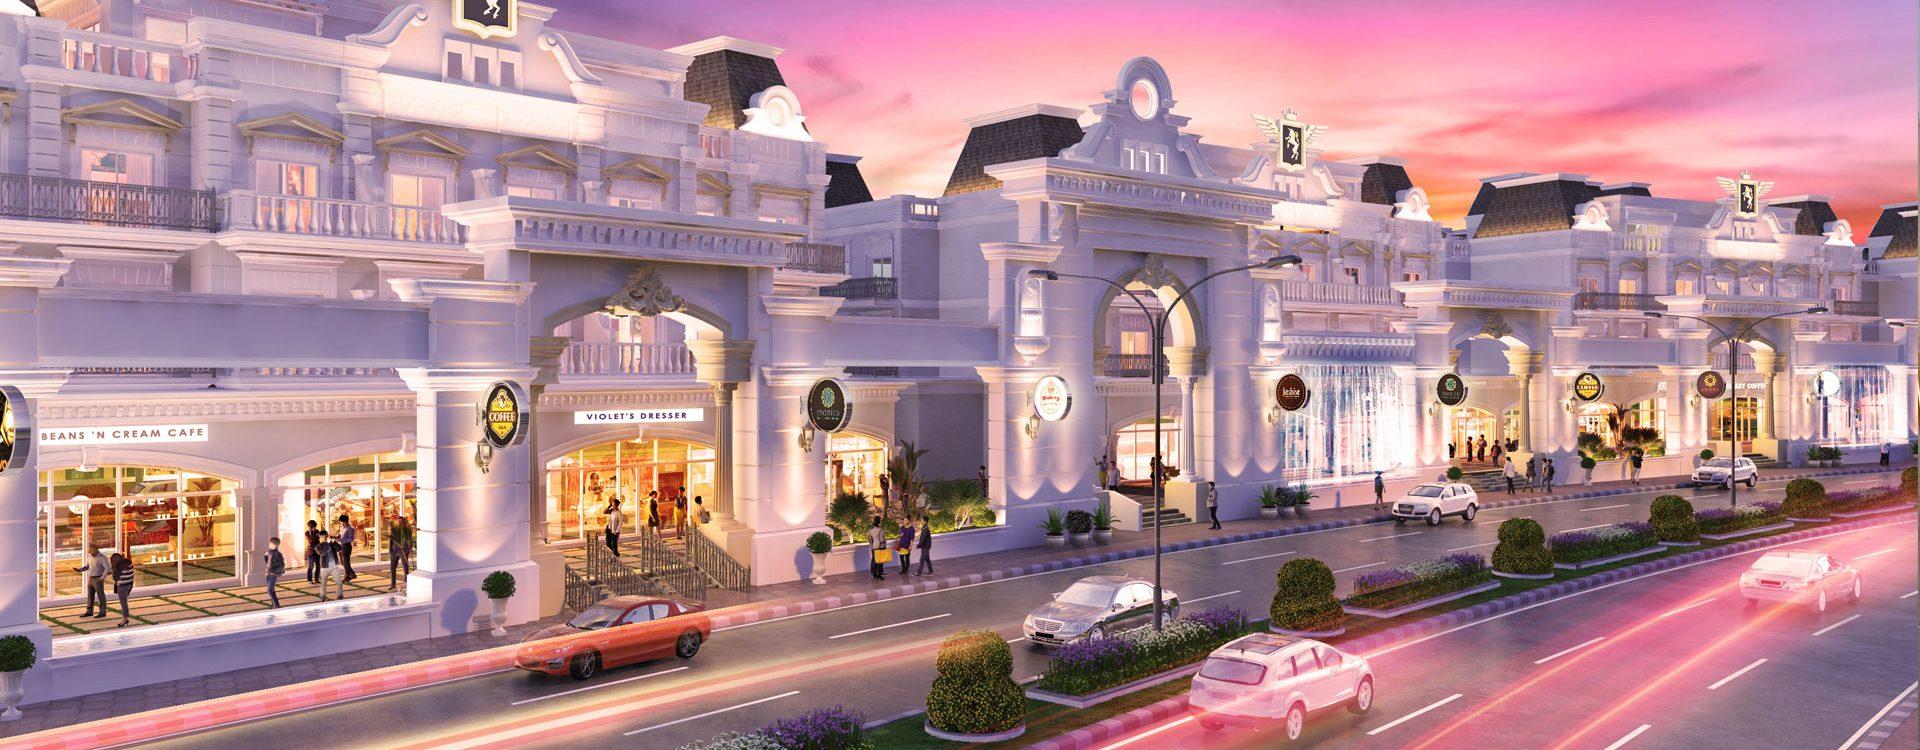 Boulevard retail